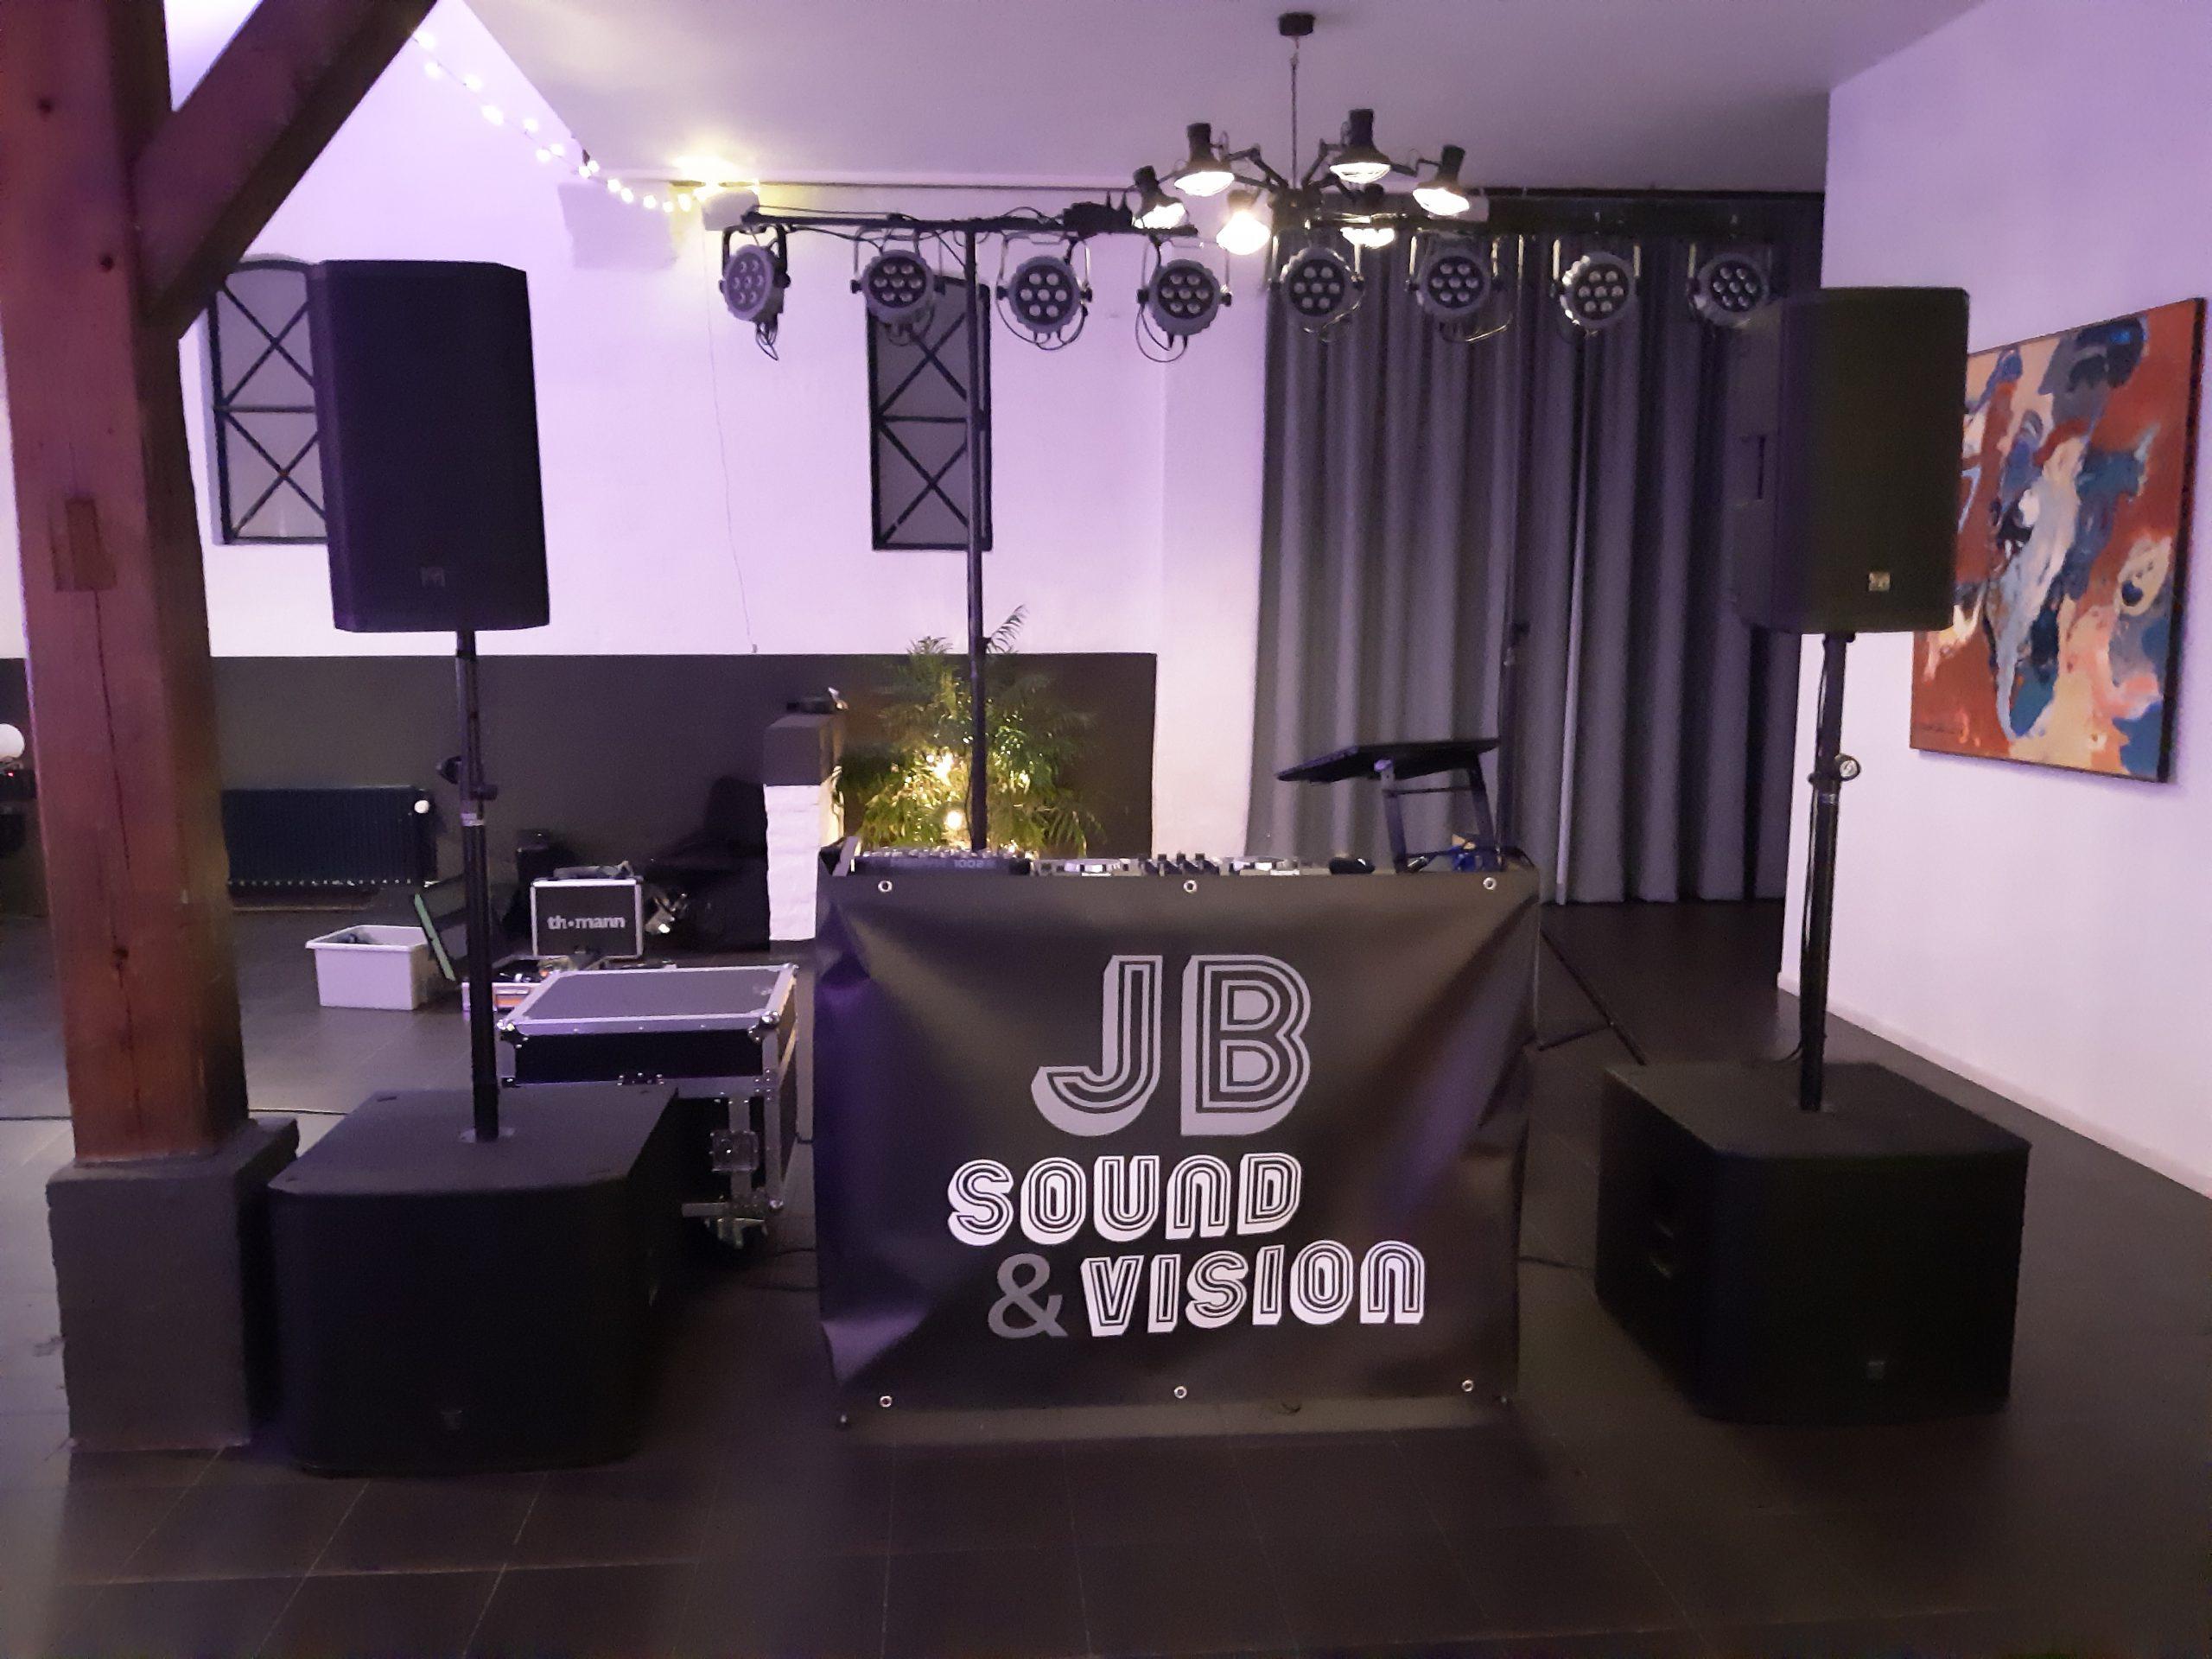 Bruiloft DJ huren Epe